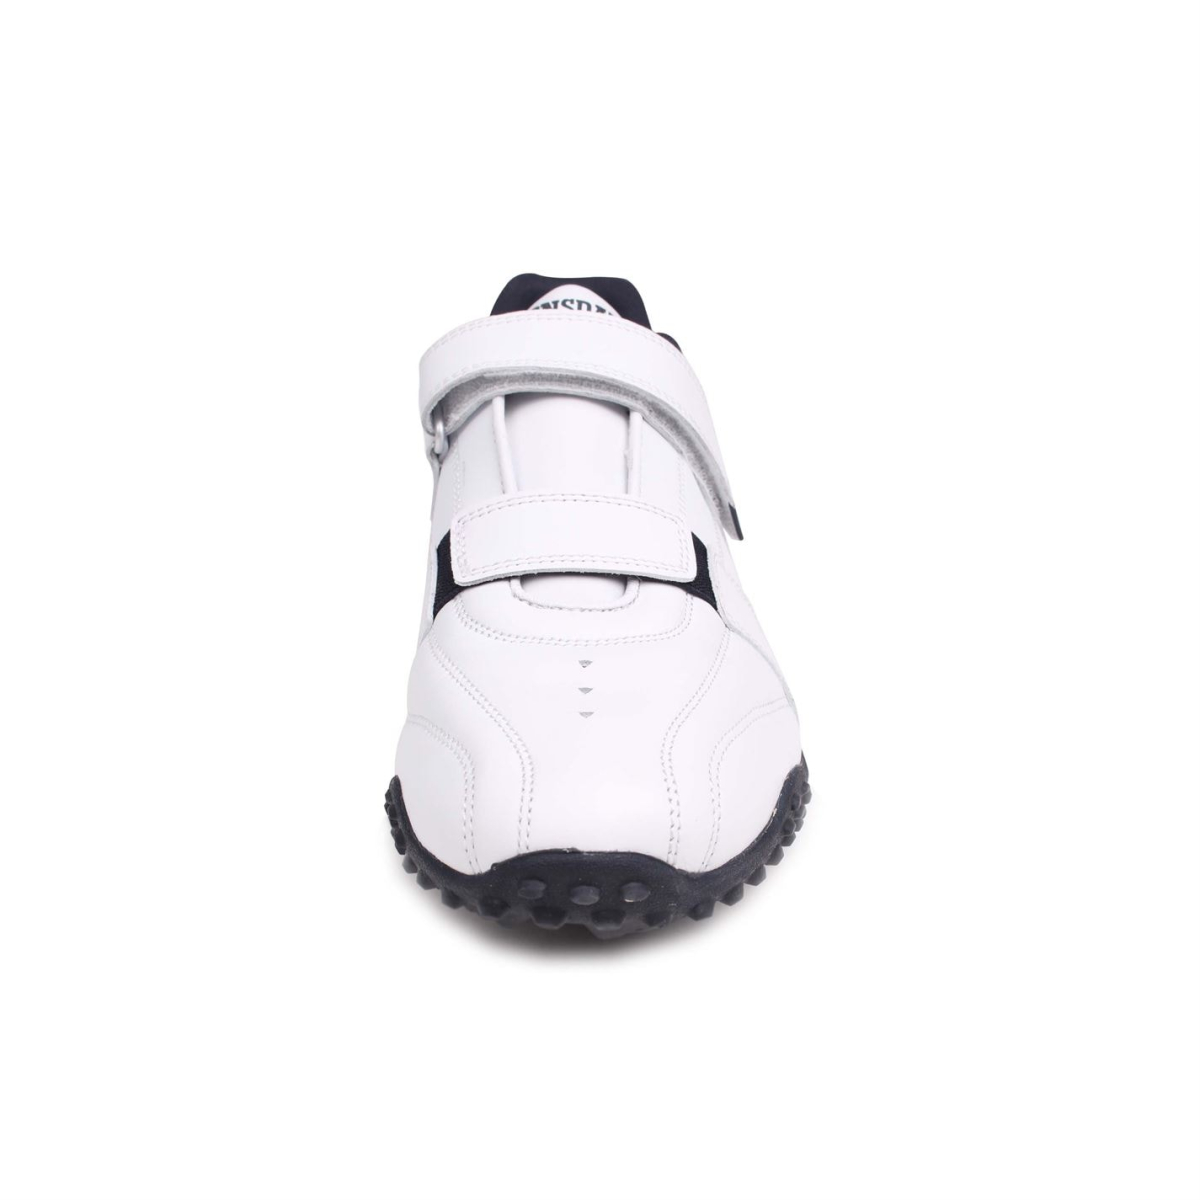 Lonsdale Herren Turnschuhe Laufschuhe Sneakers Sportschuhe Jogging Fulham 5159